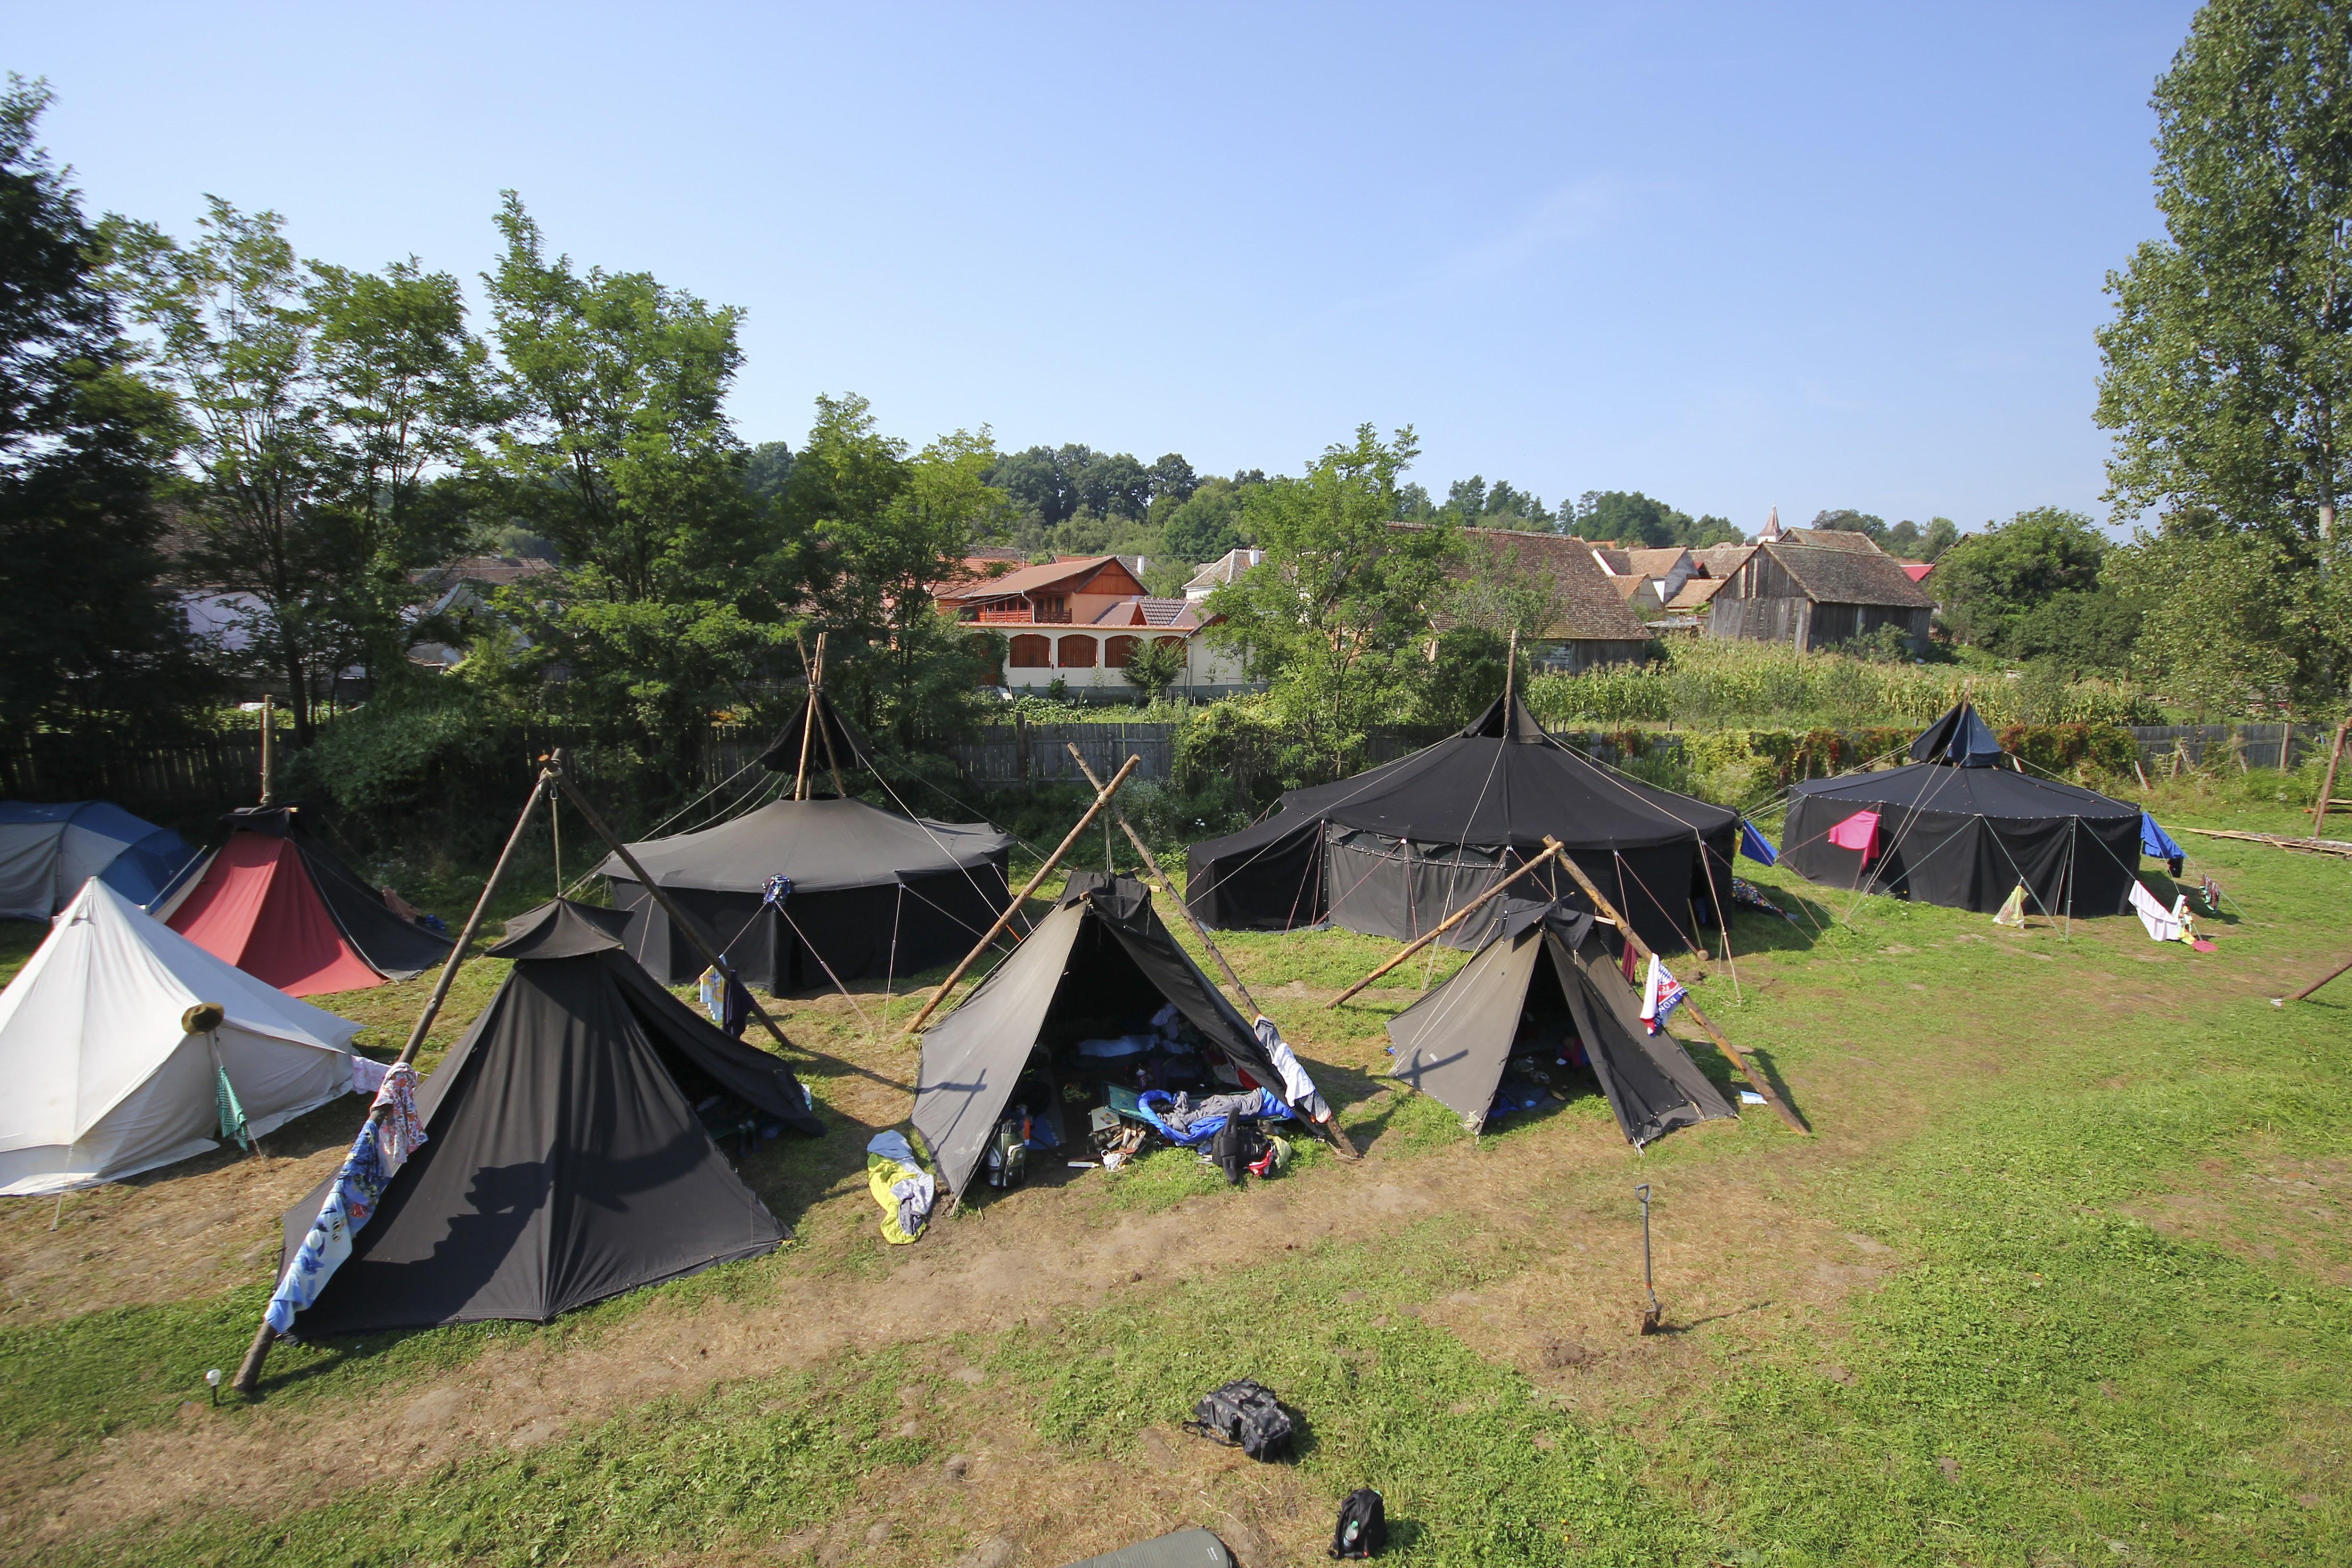 German tents